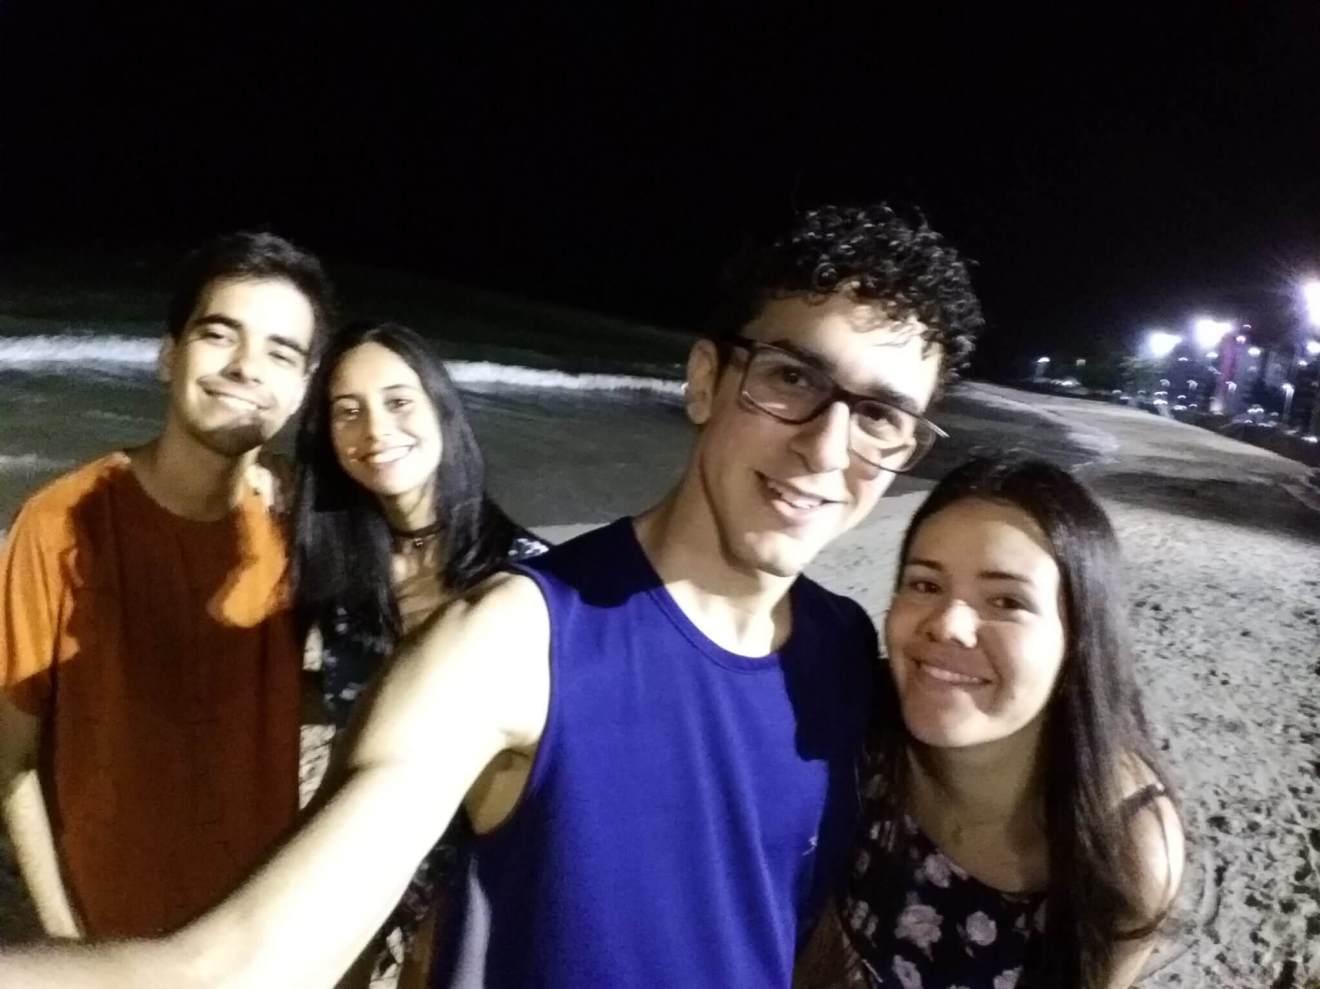 P 20171028 184811 vHDR Auto - REVIEW: Zenfone 4 Selfie Pro é um sonho para os amantes de selfies